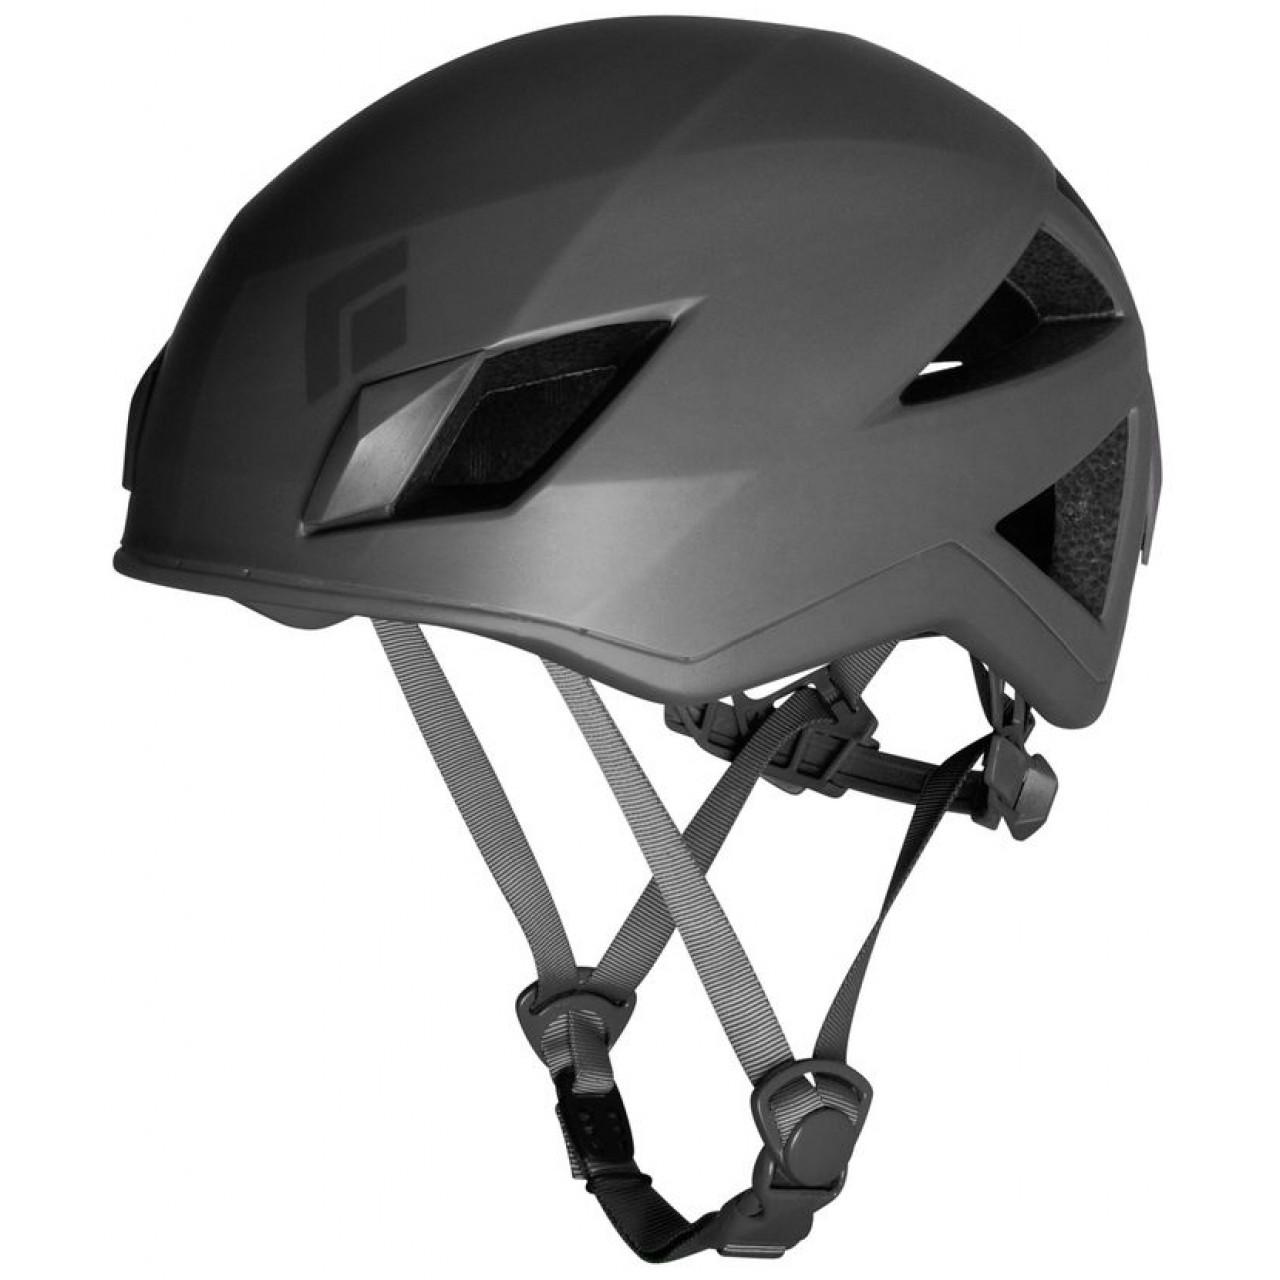 1280x1280 Black Diamond Vector Helmets Bananafingers